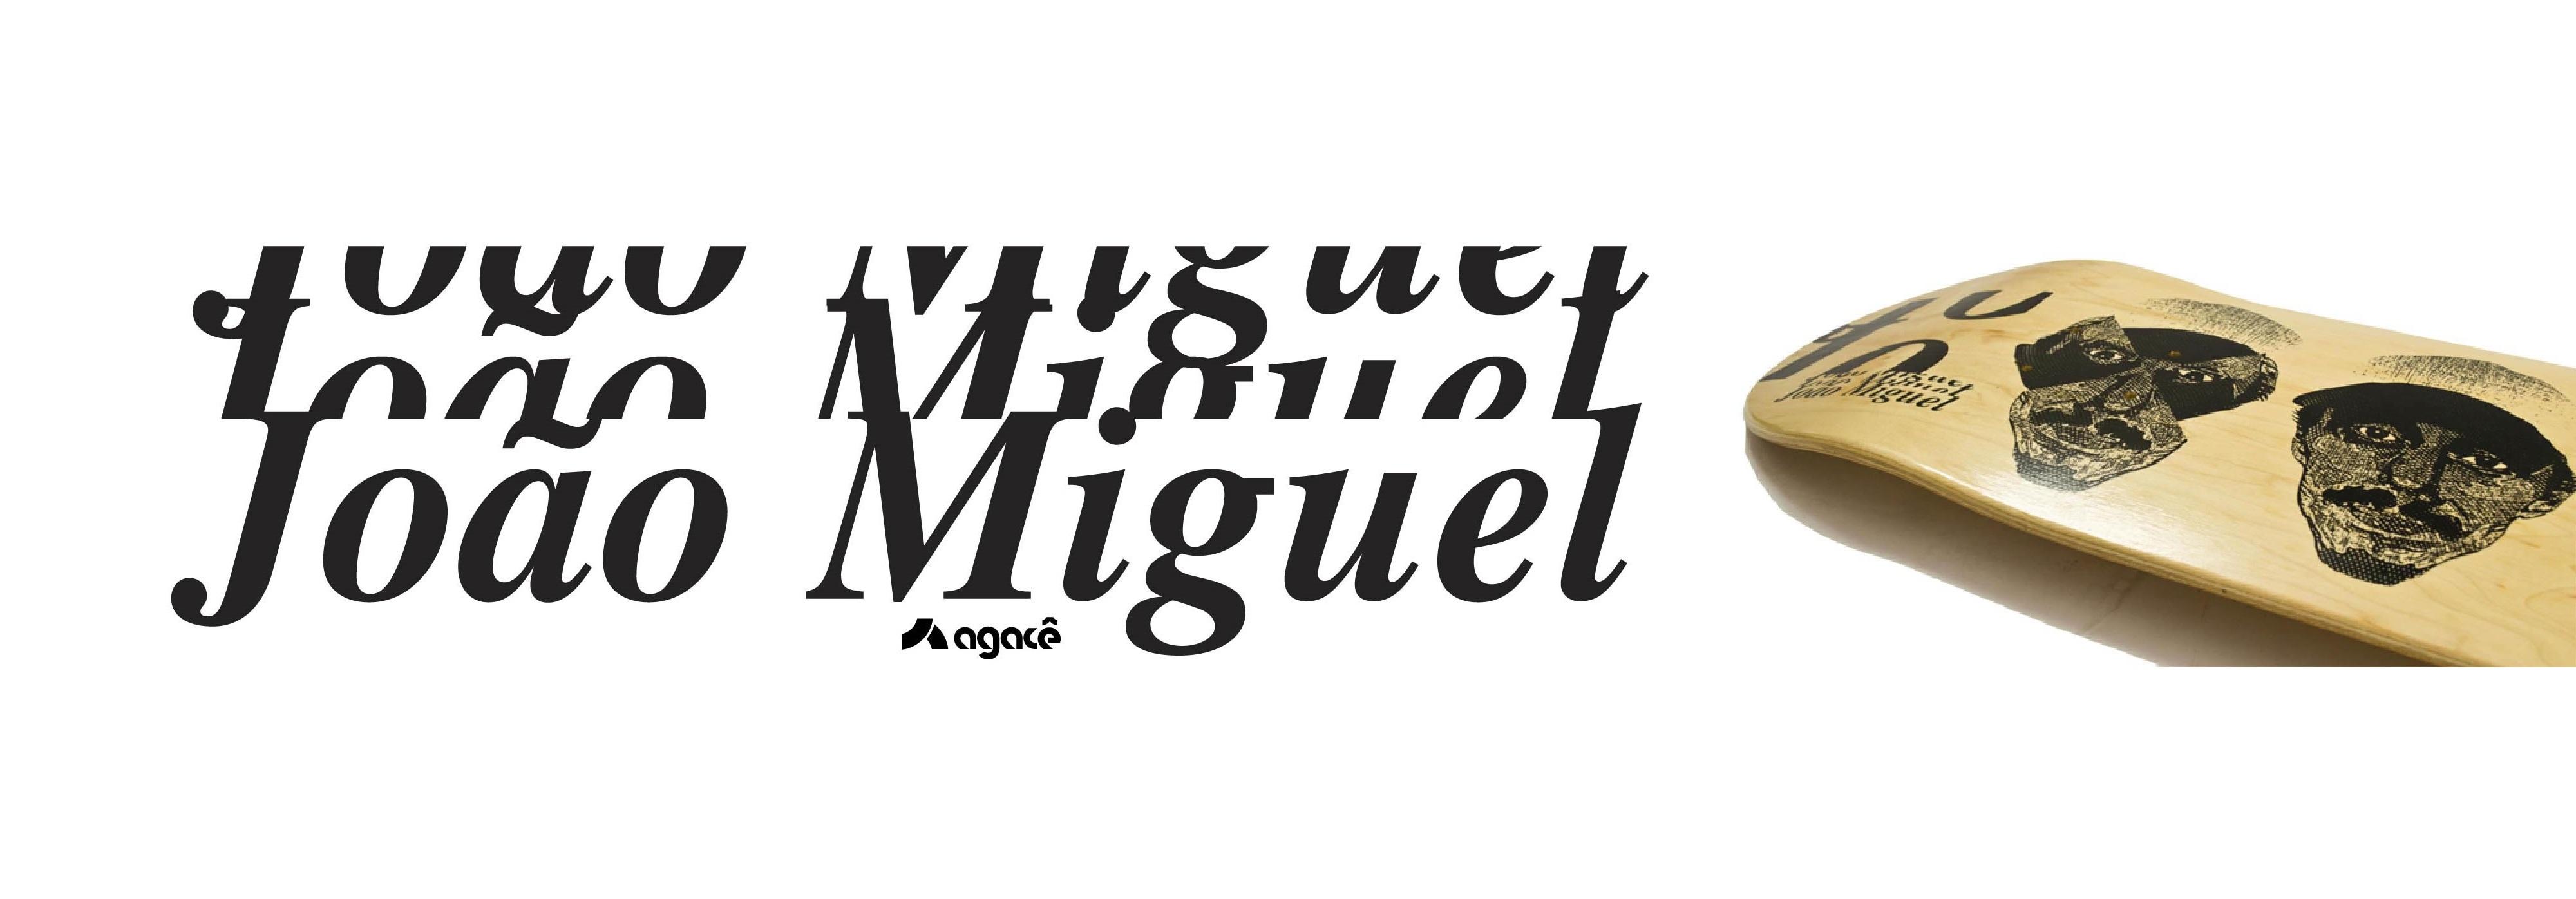 Pro Model J-Miguel Disponível